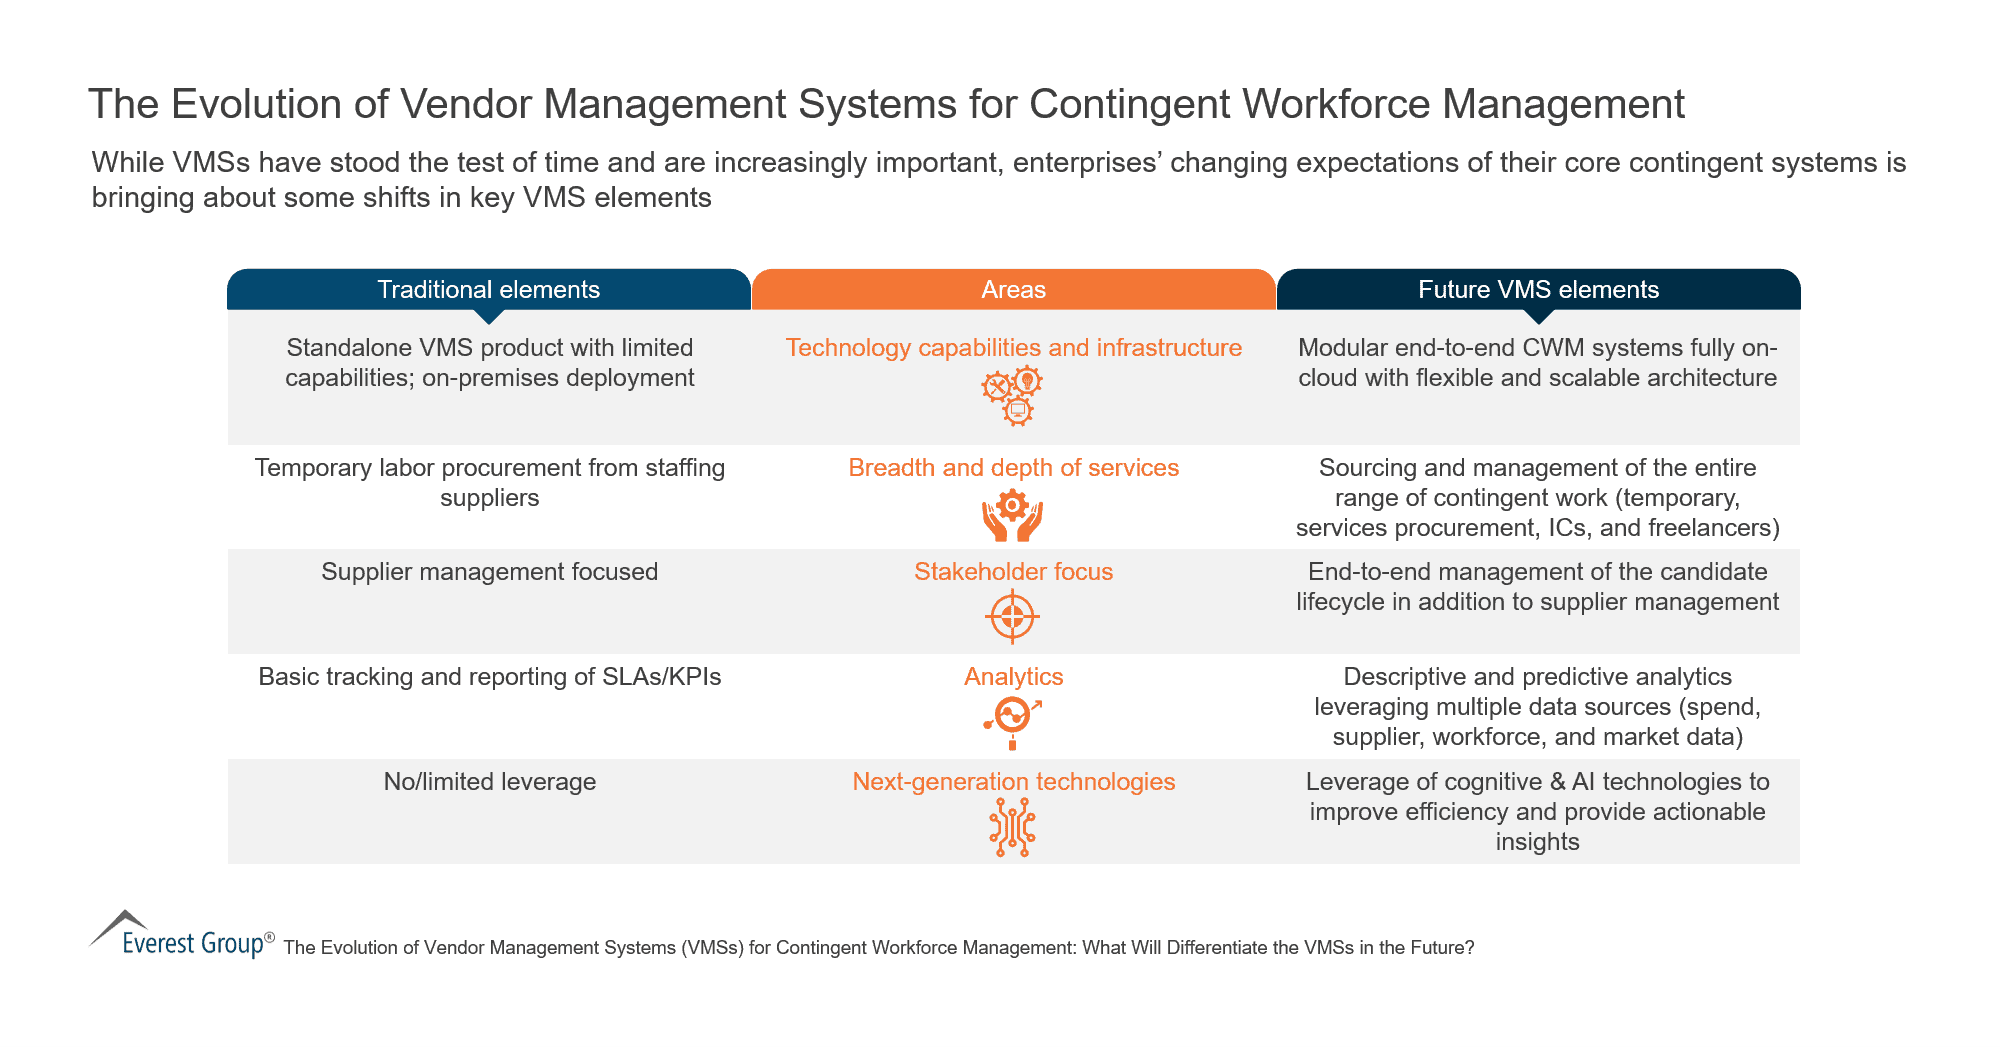 The Evolution of Vendor Management Systems for Contingent Workforce Management